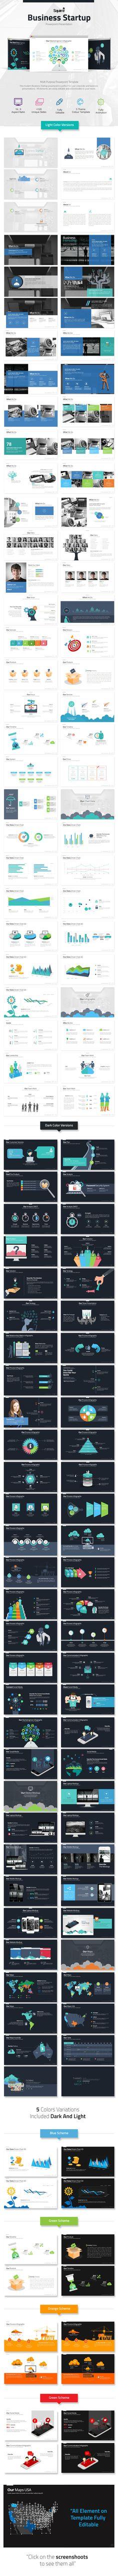 Business Startup Powerpoint Presentation (PowerPoint Templates)